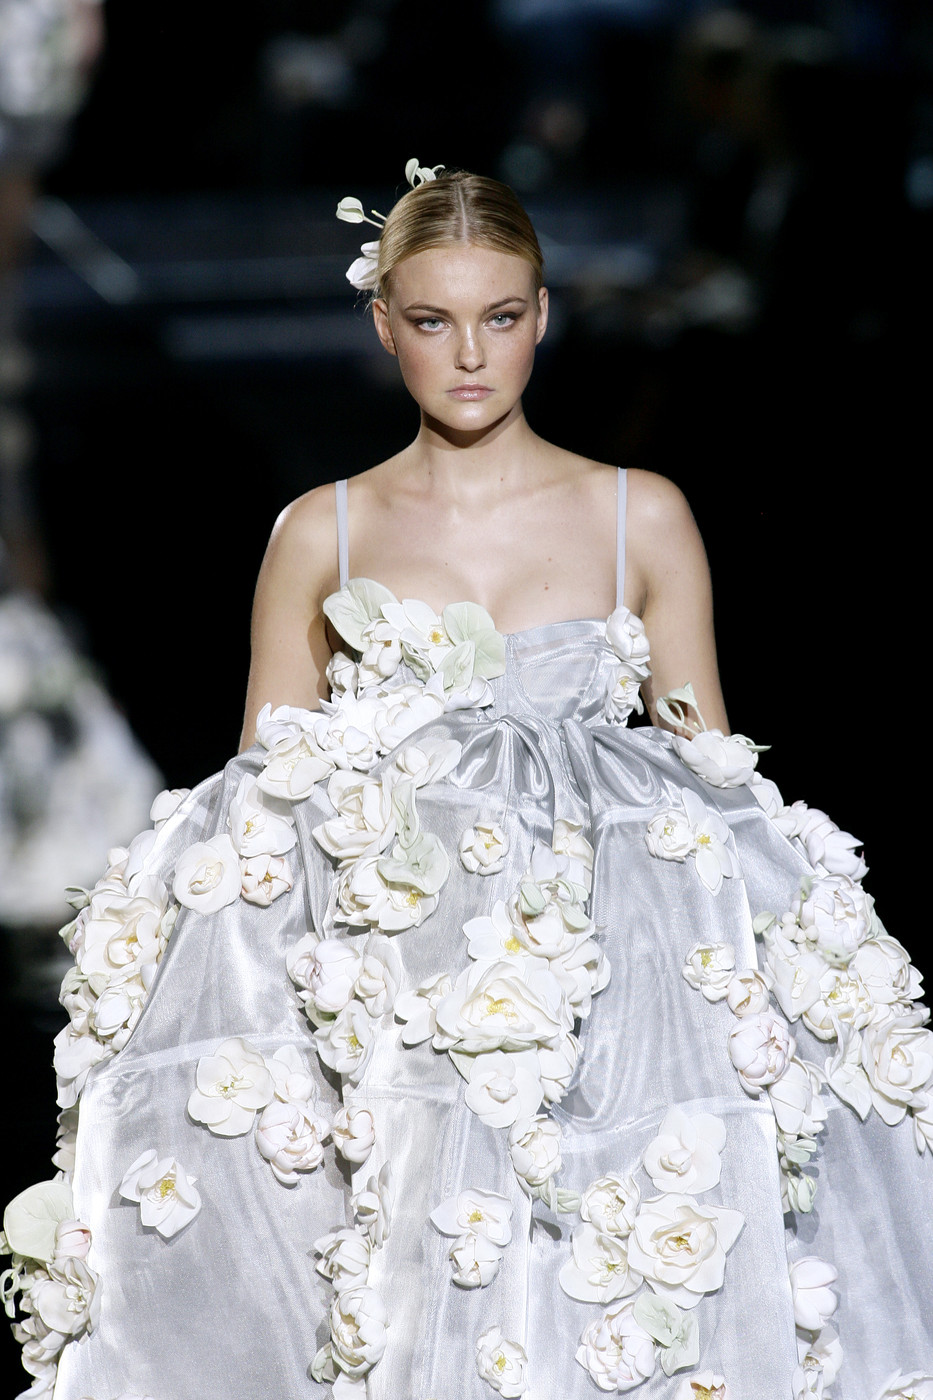 Dolce&Gabbana Spring/Summer 2009